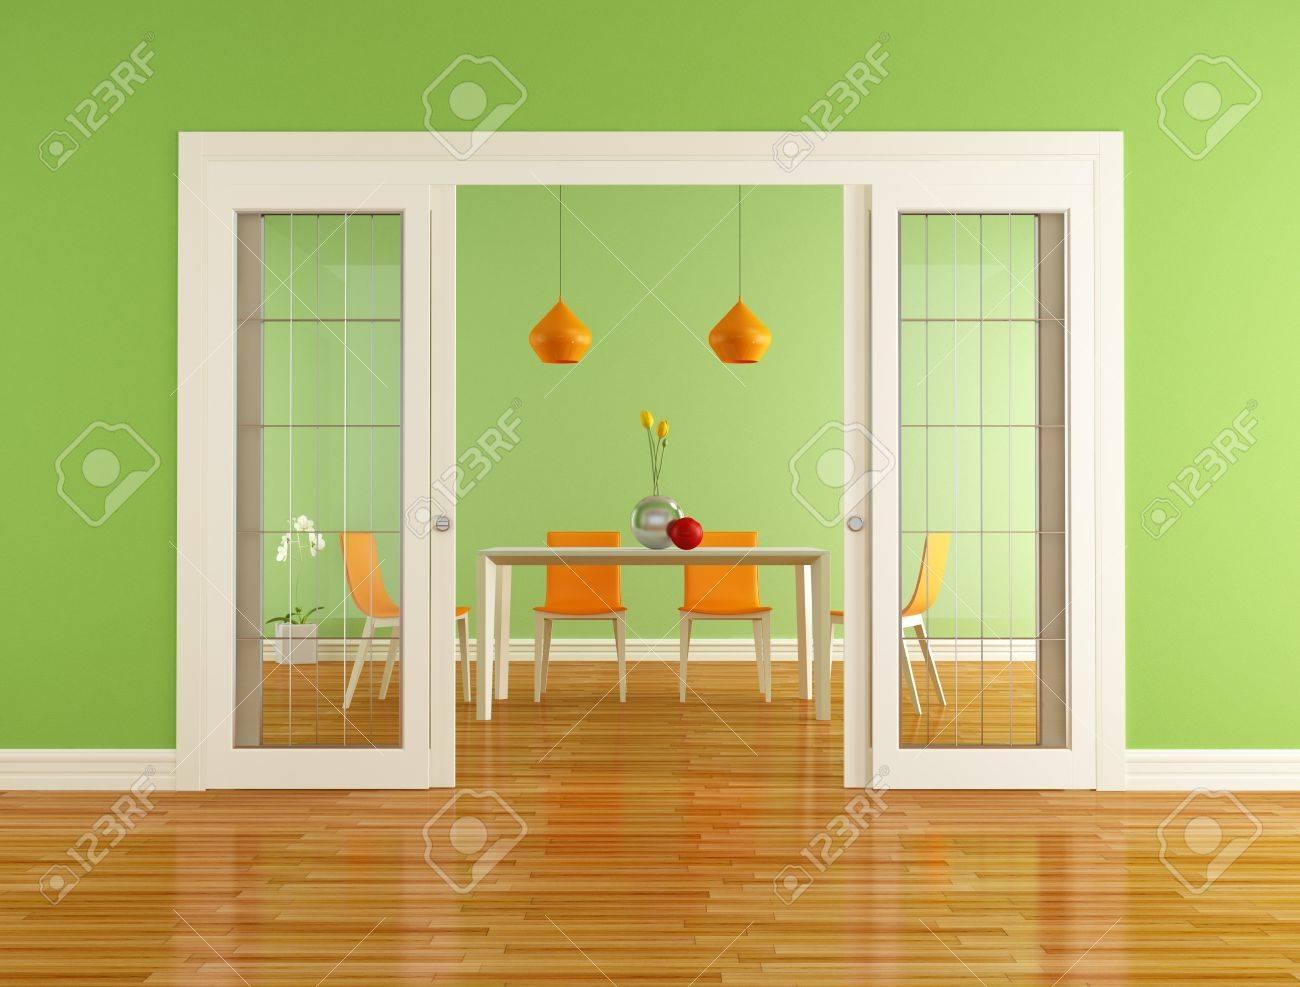 Green And Orange Dining Room With Open Sliding Door